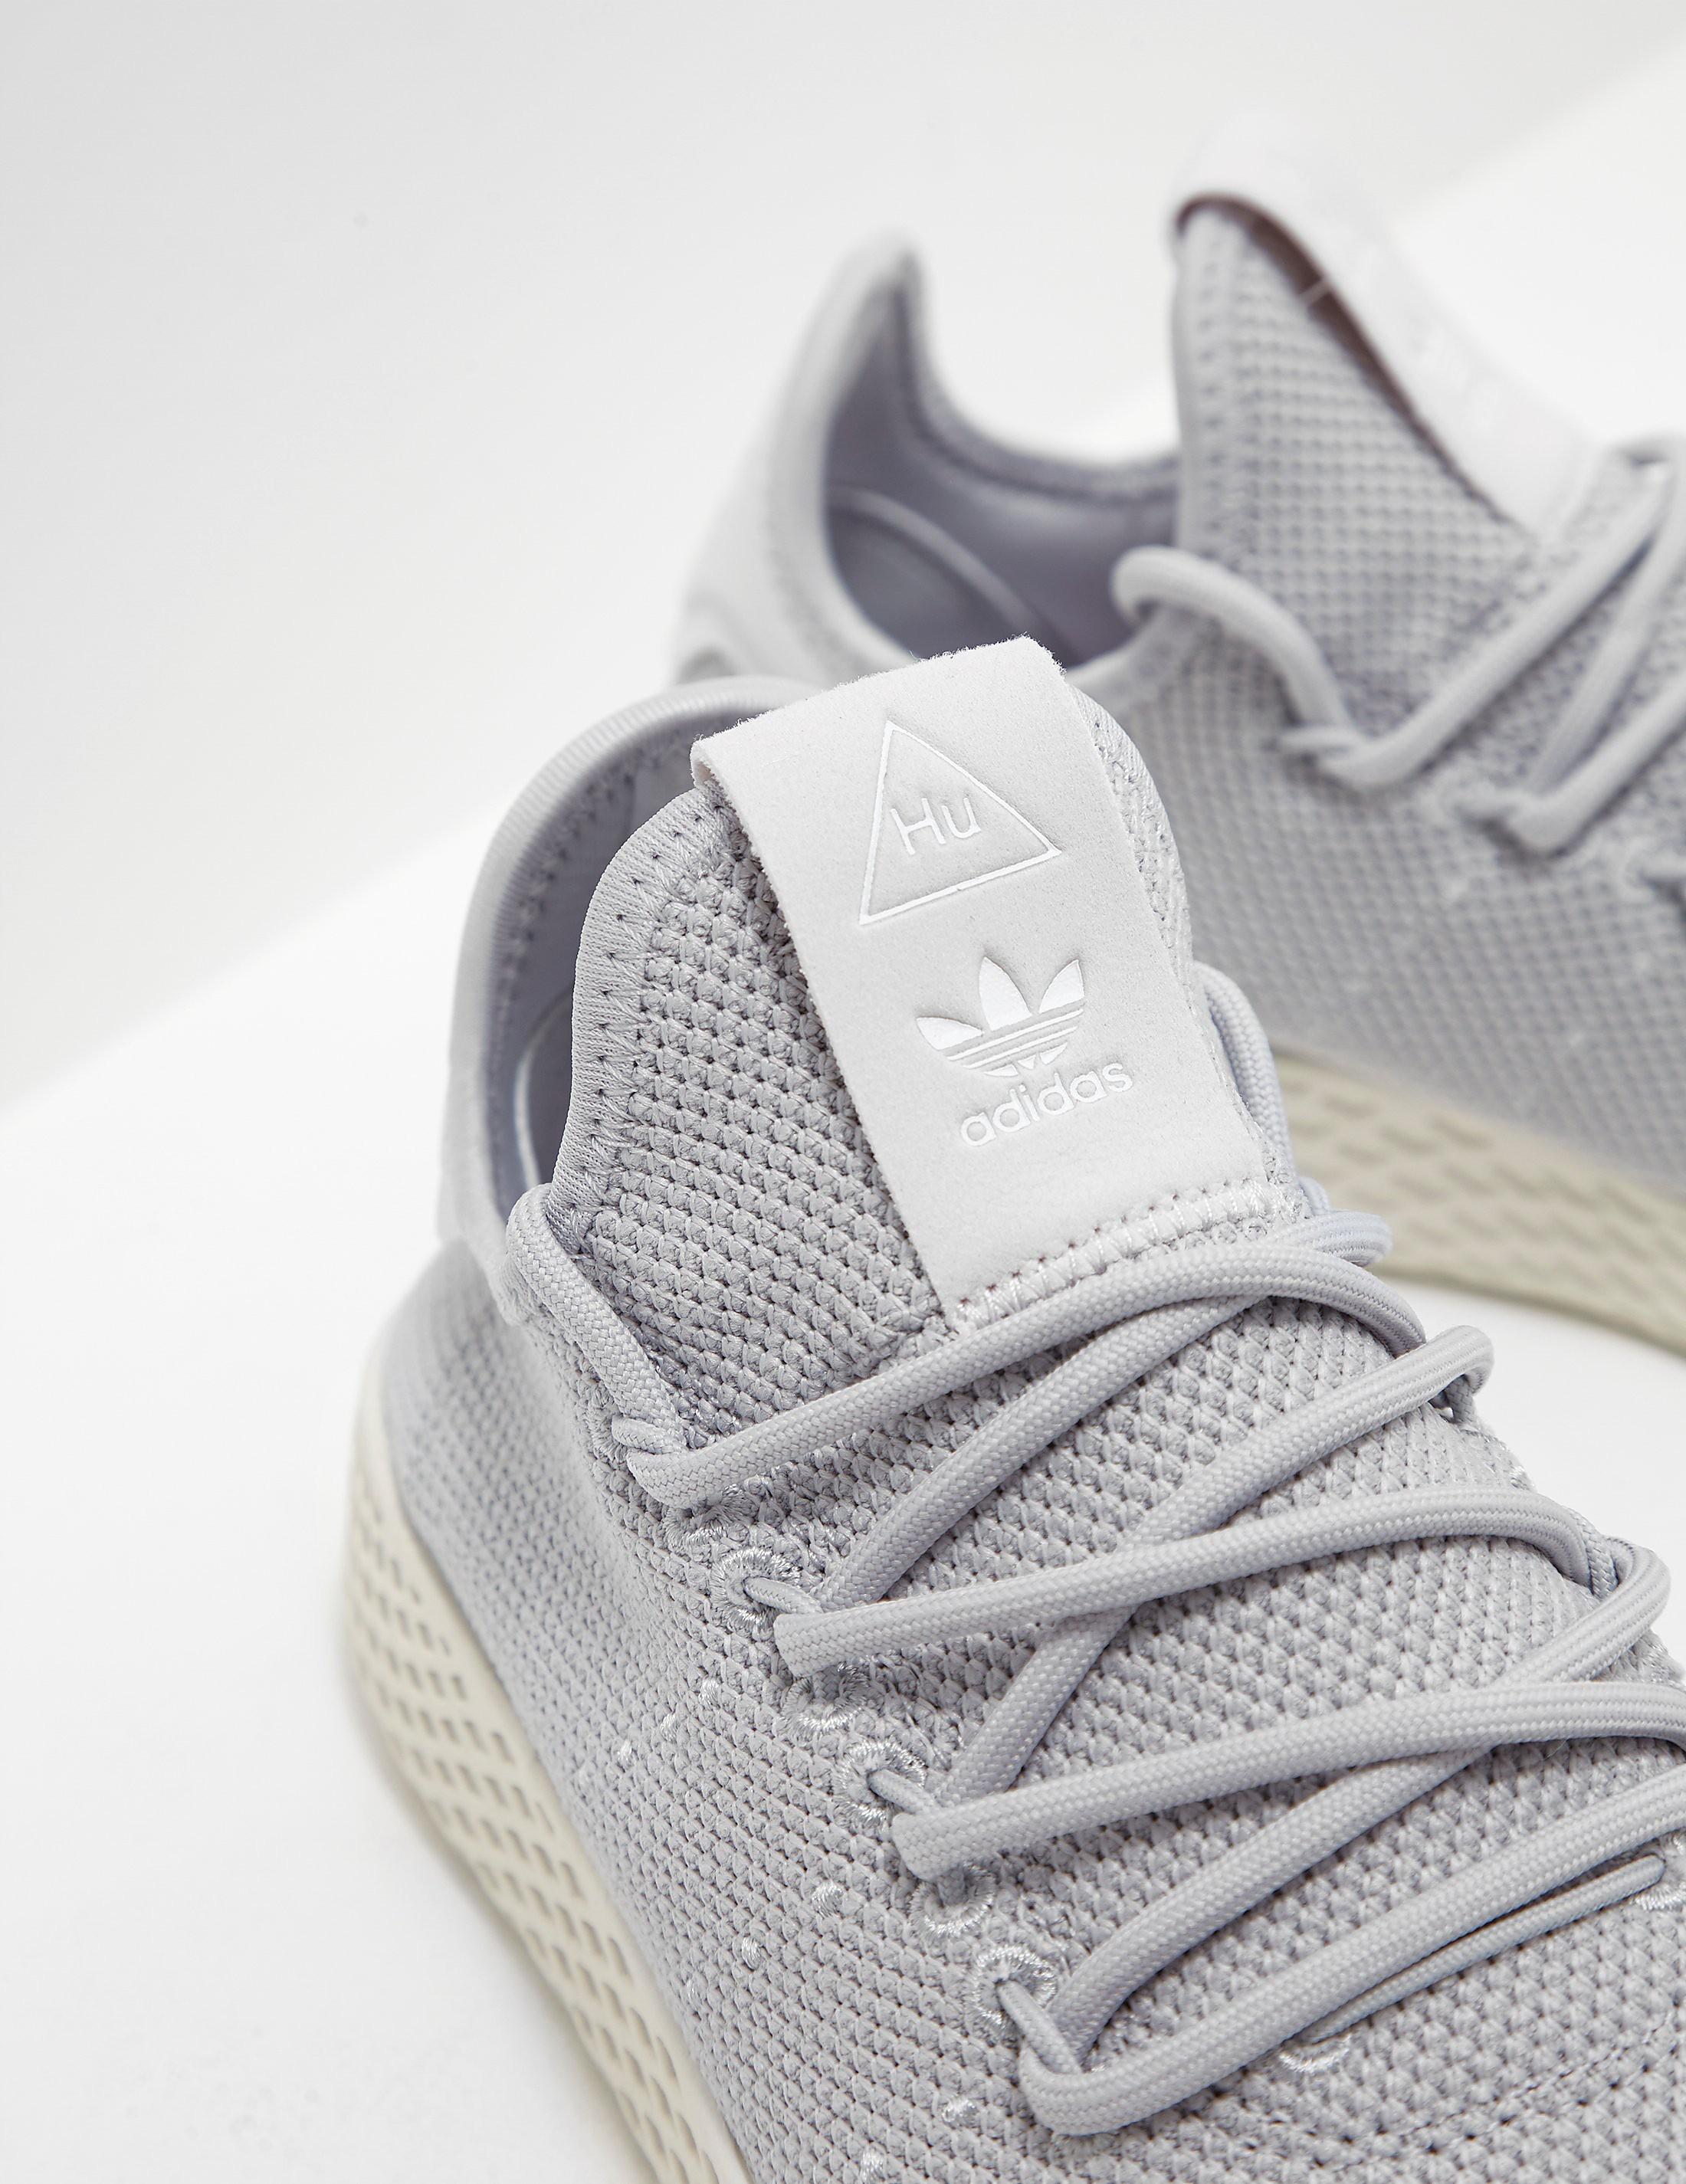 adidas Originals Pharrell Williams Tennis Hu Trainers Women's